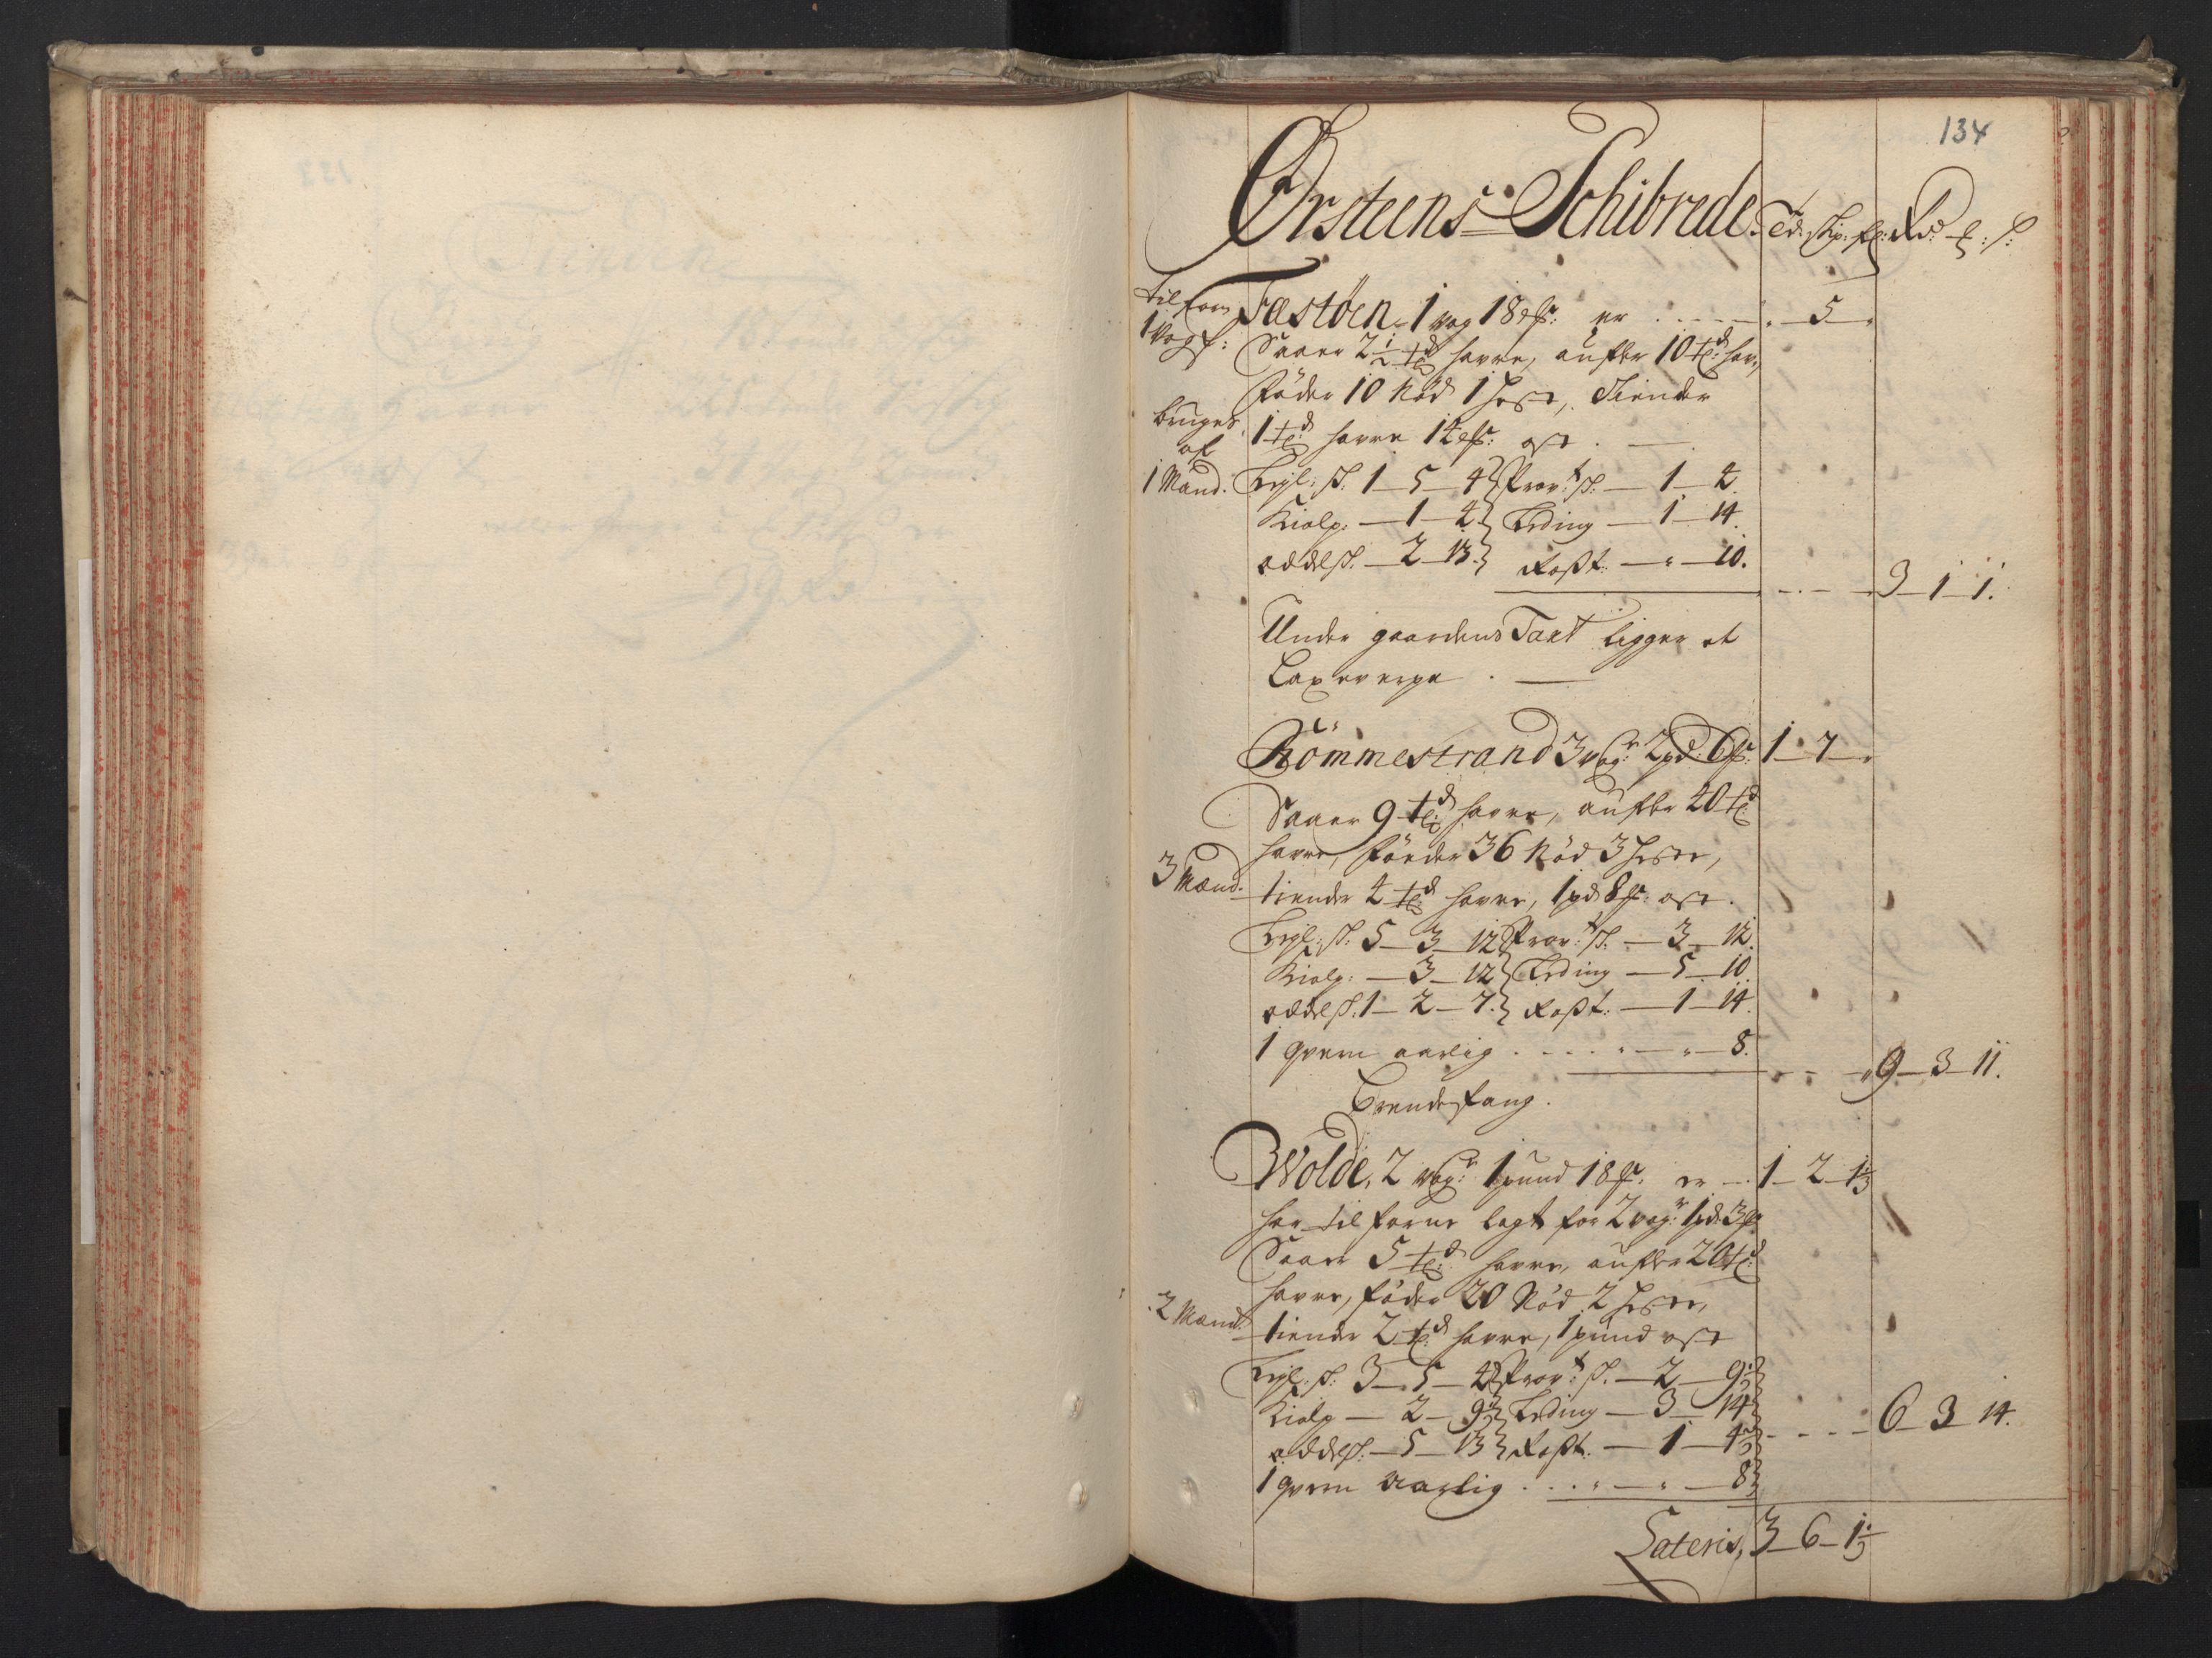 RA, Rentekammeret inntil 1814, Realistisk ordnet avdeling, N/Nb/Nbf/L0148: Sunnmøre, prøvematrikkel, 1714, s. 133b-134a